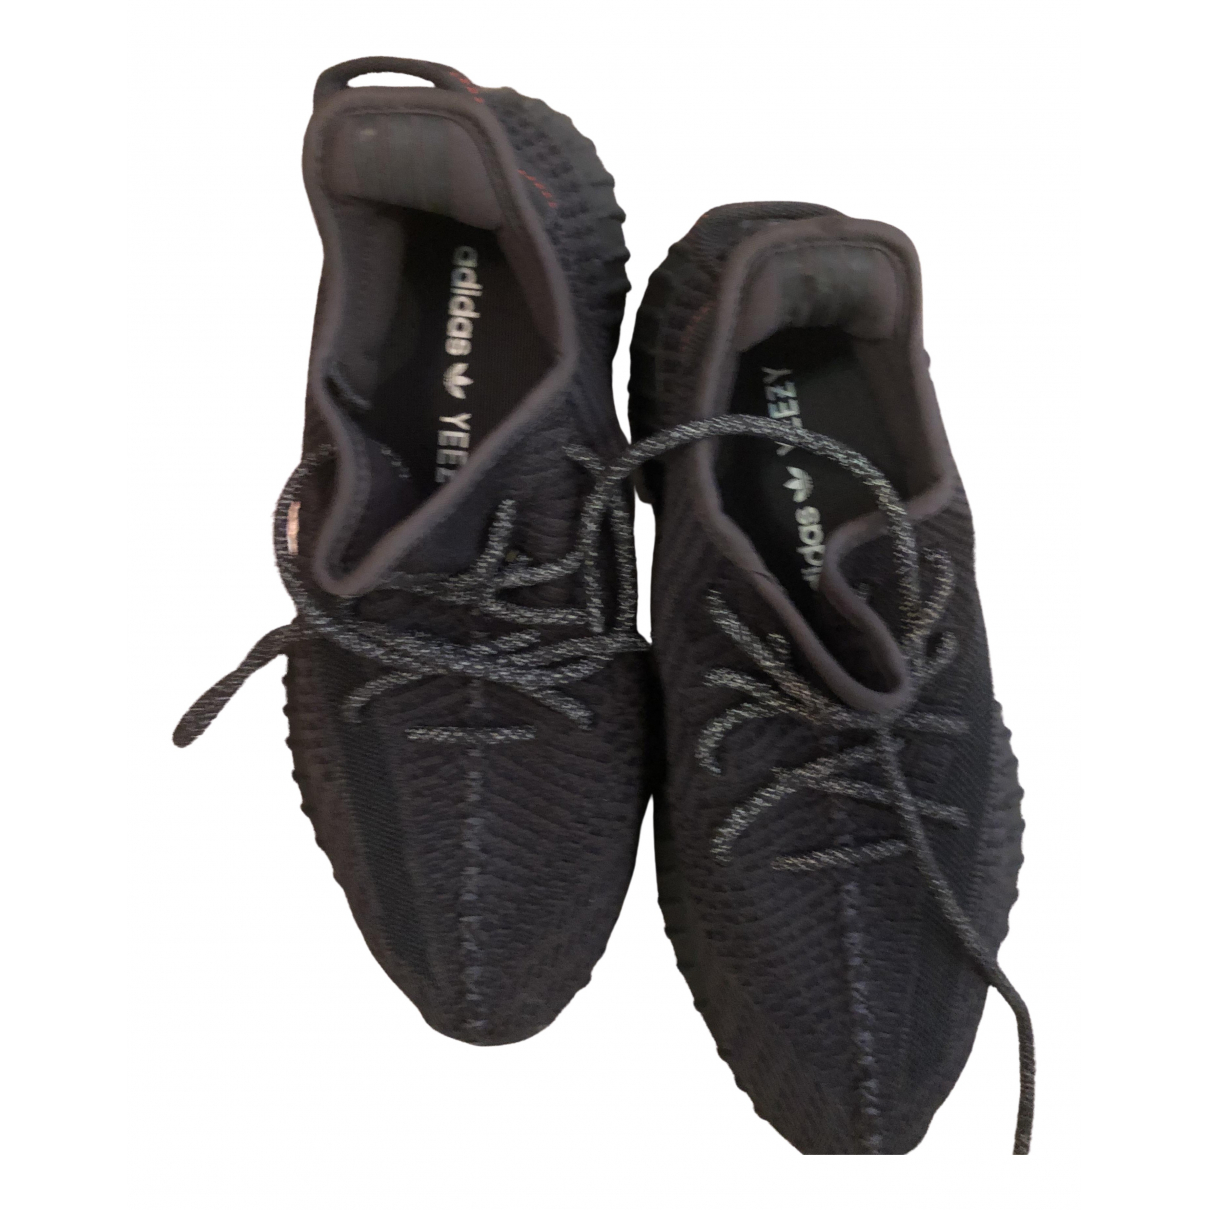 Yeezy X Adidas - Baskets Boost 350 V2 pour femme - noir